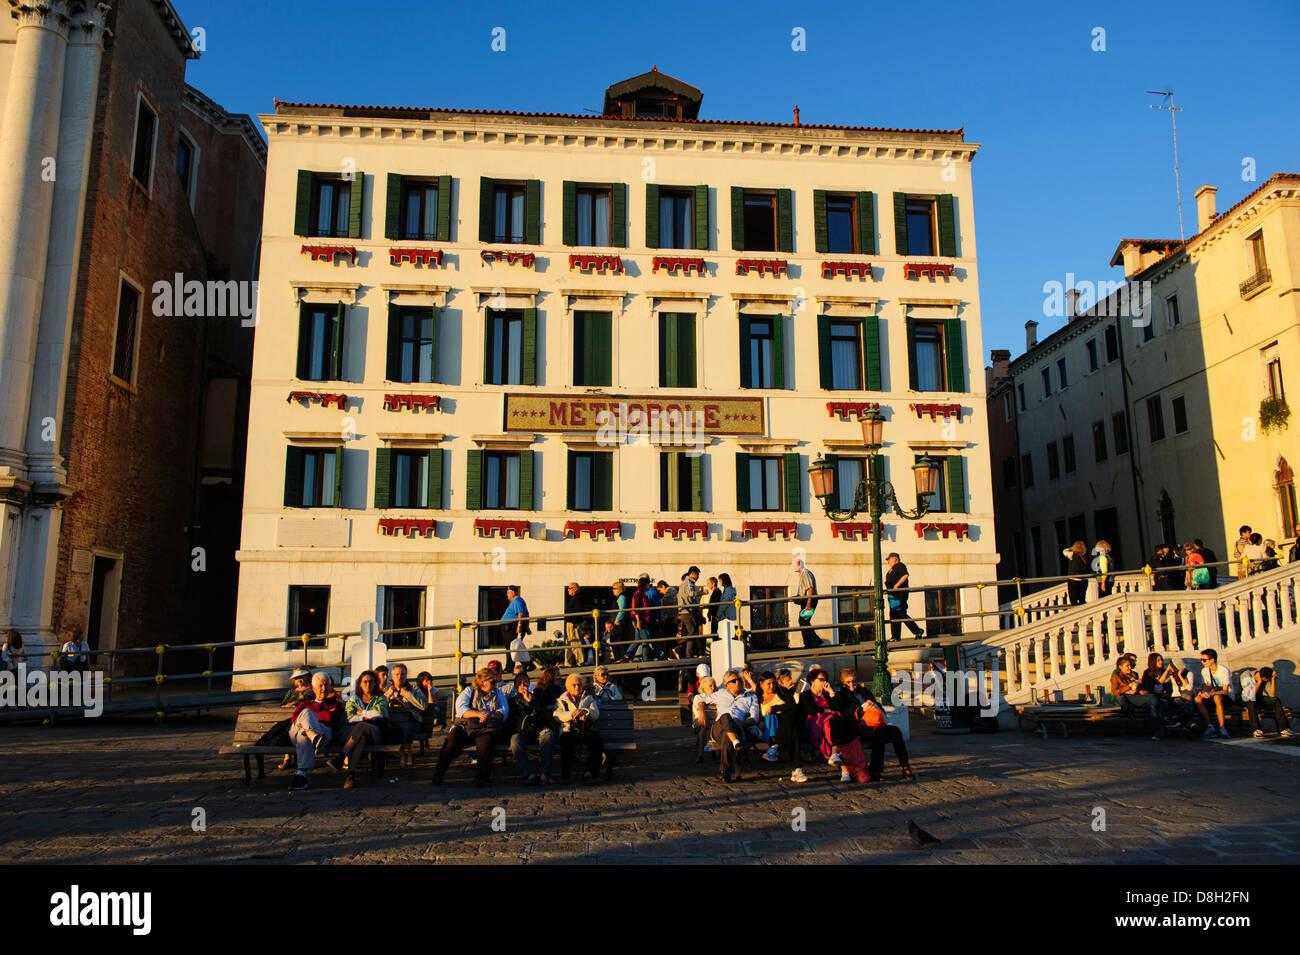 Hotel Metropole in Venedig, Italien. Stockbild